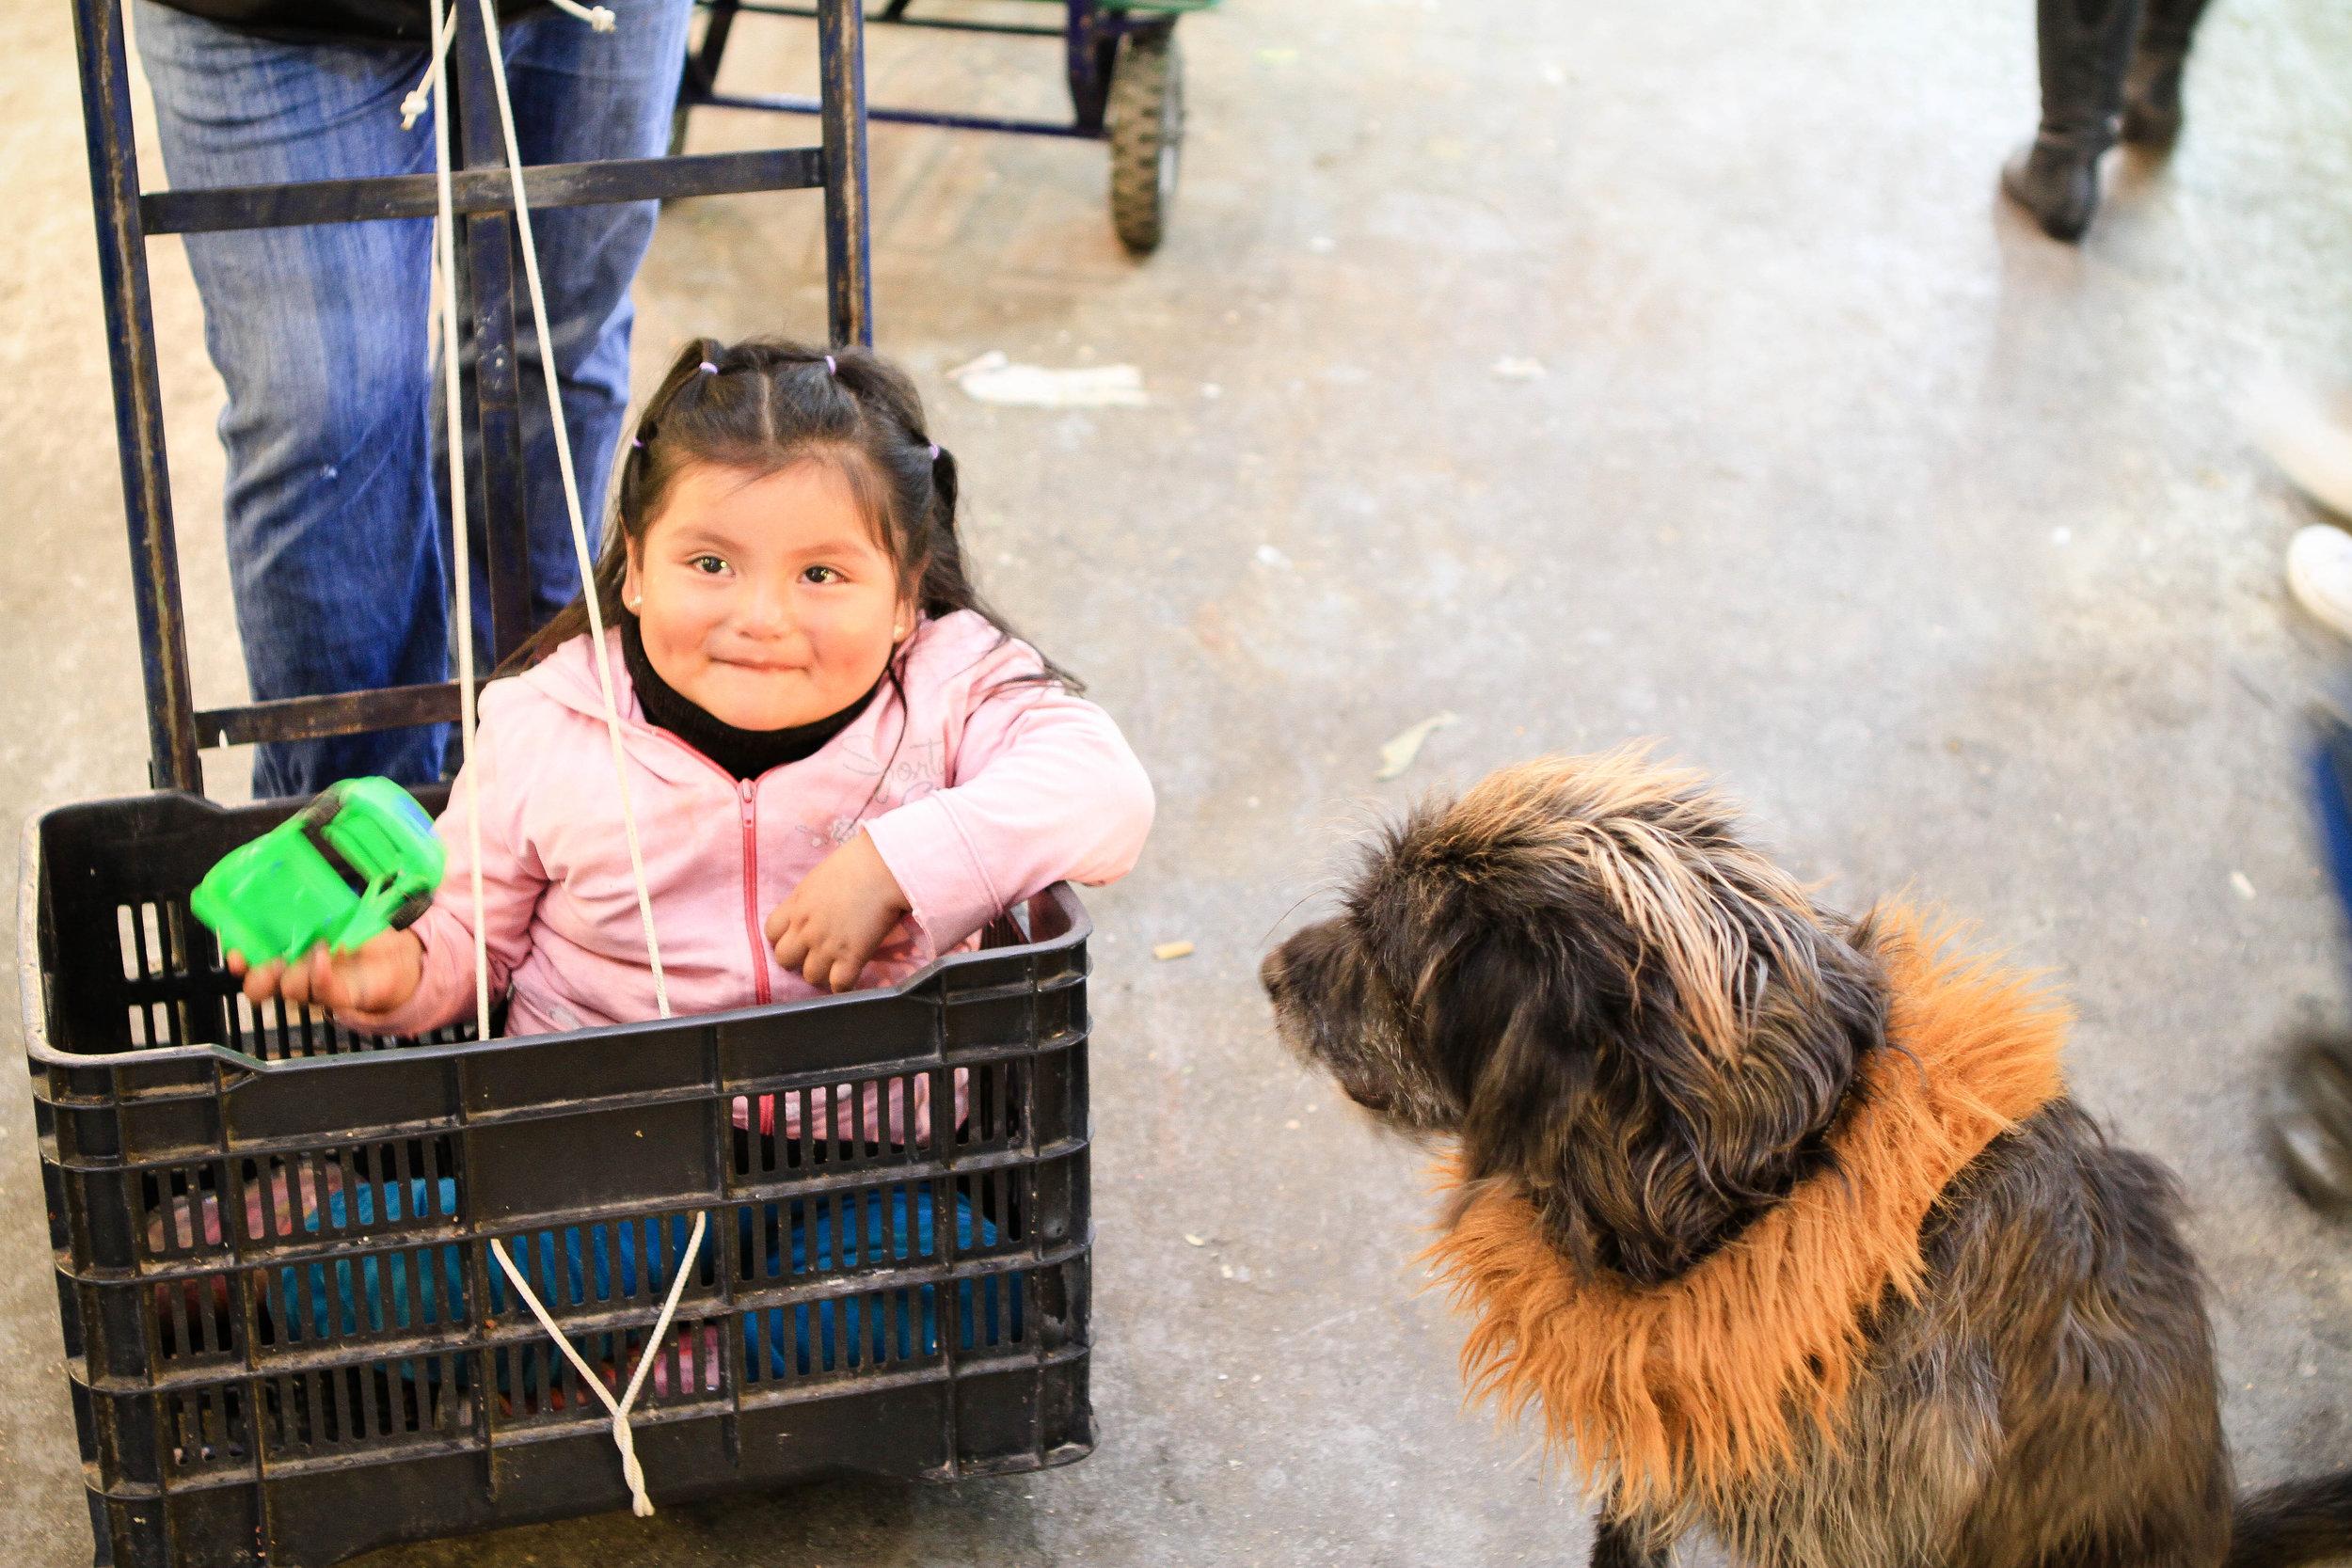 La Merced Market - Mexico City, Mexico